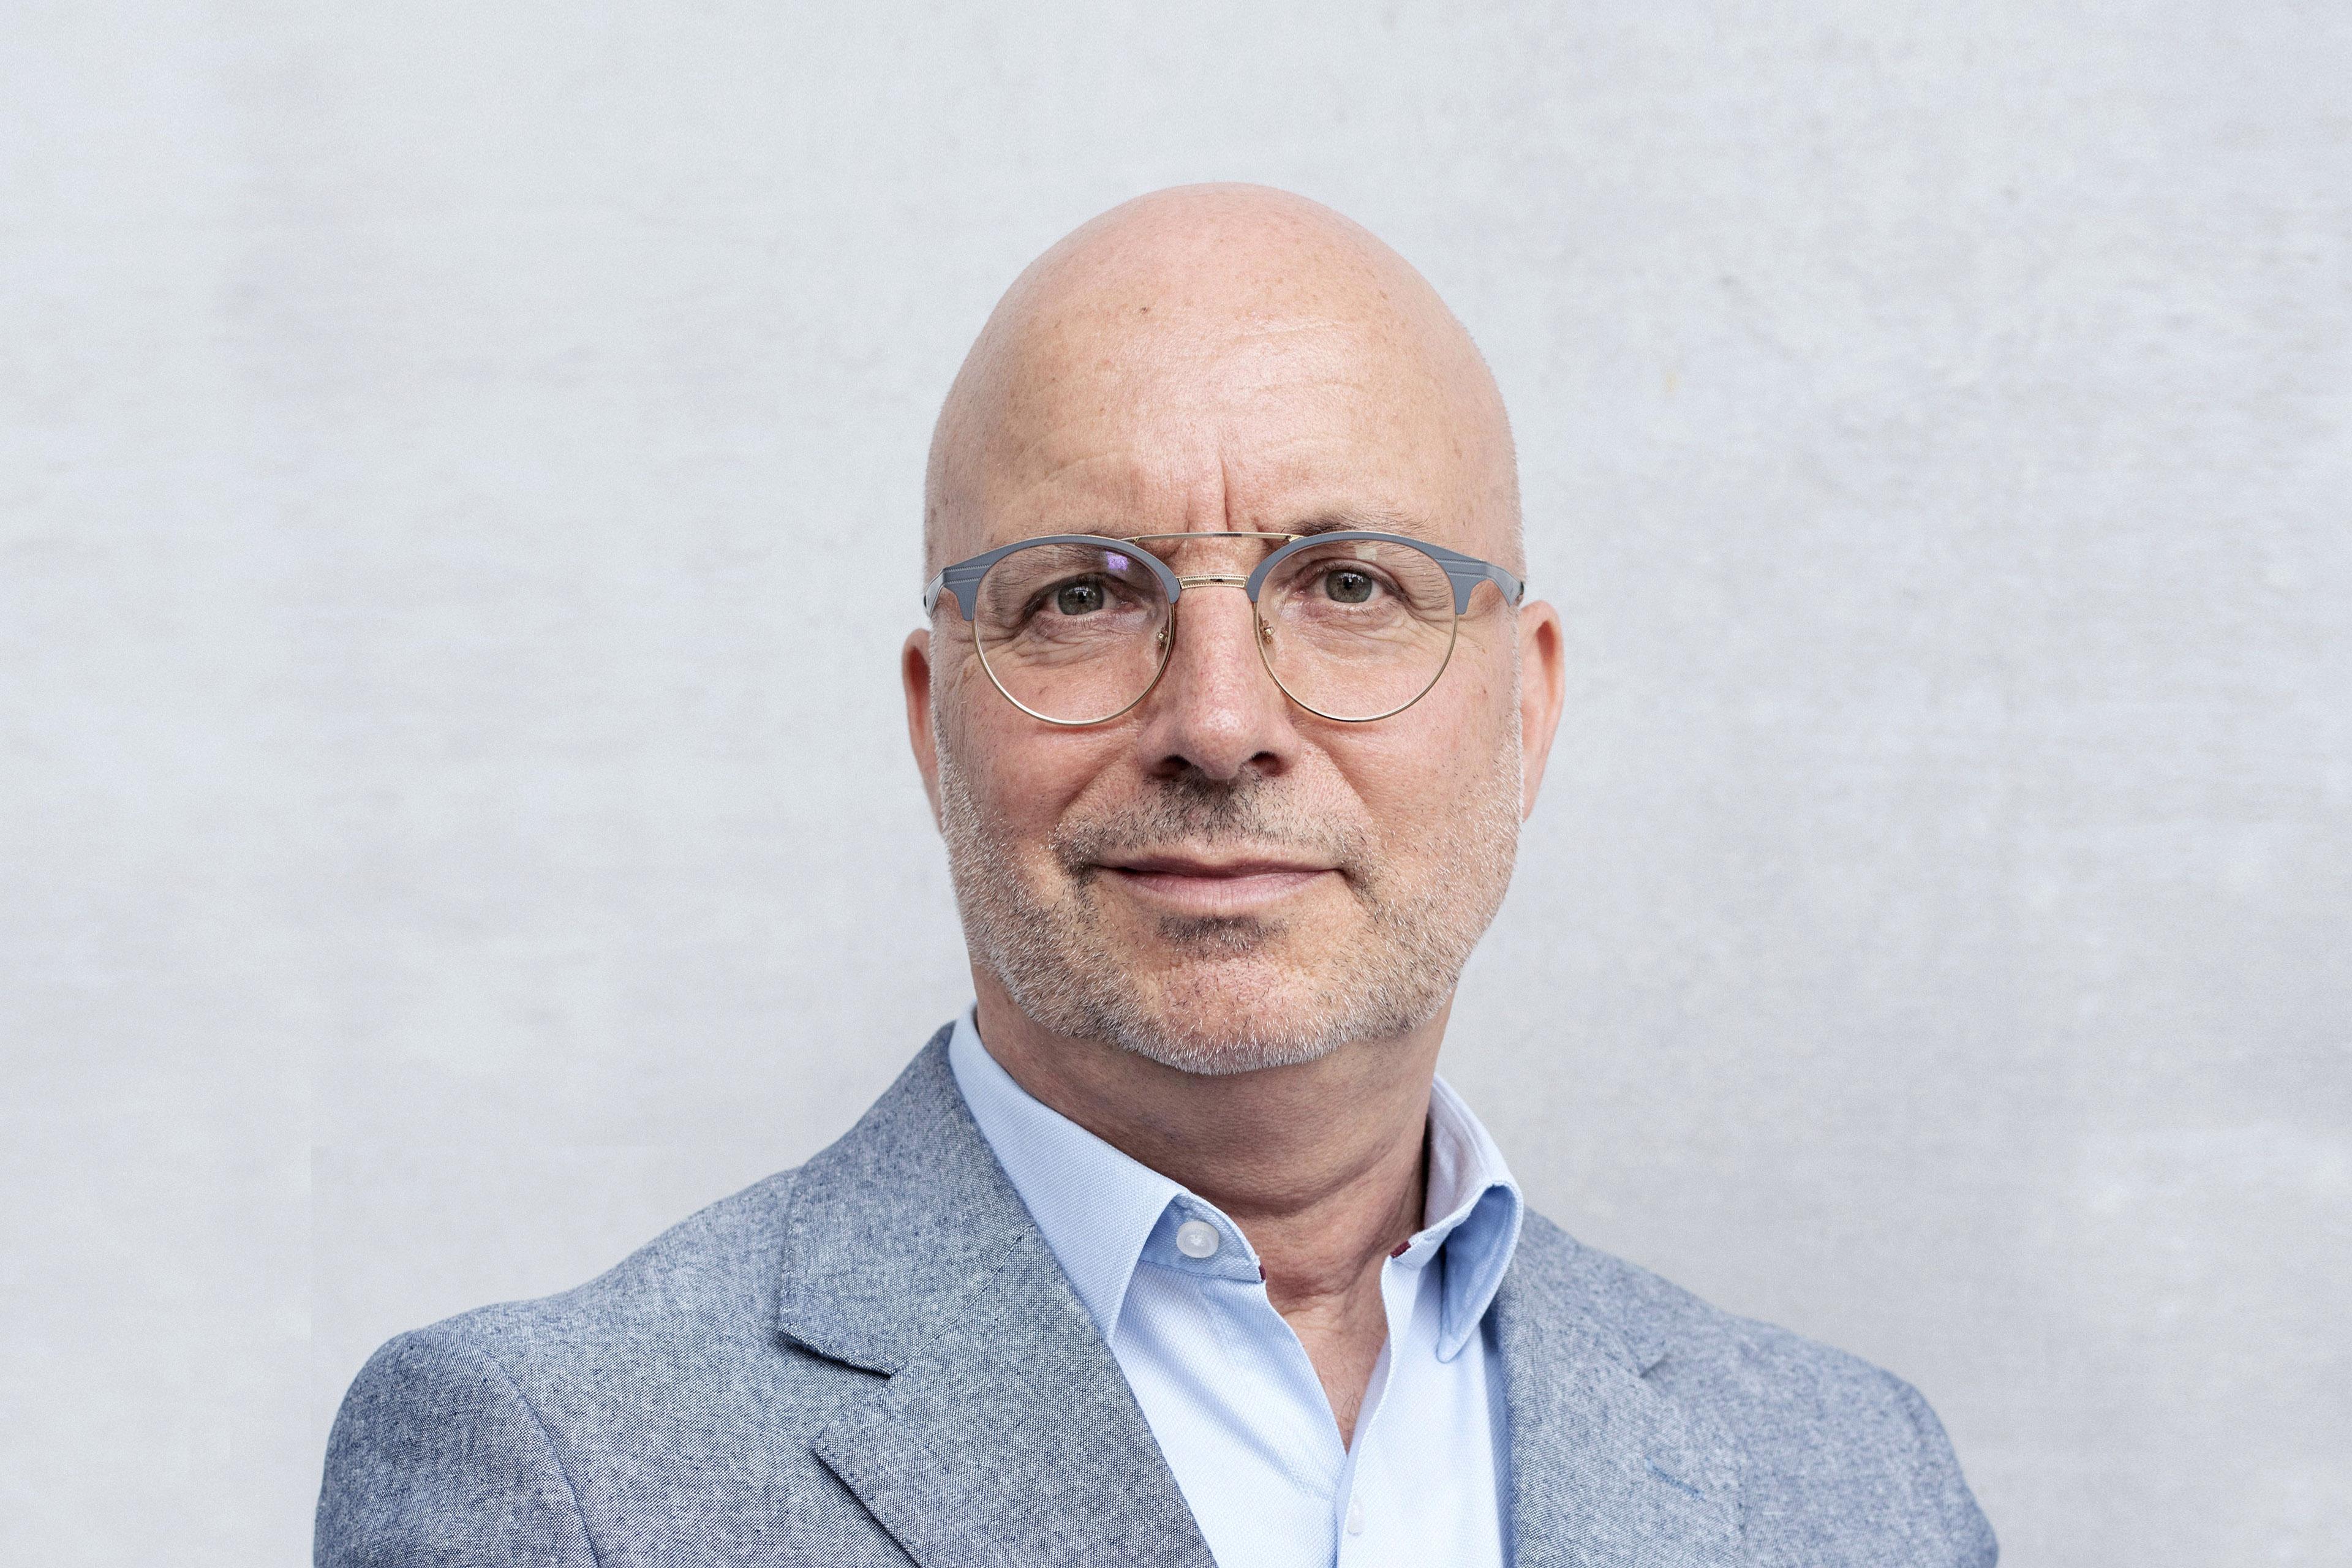 A portrait of Bernhart Schwenk